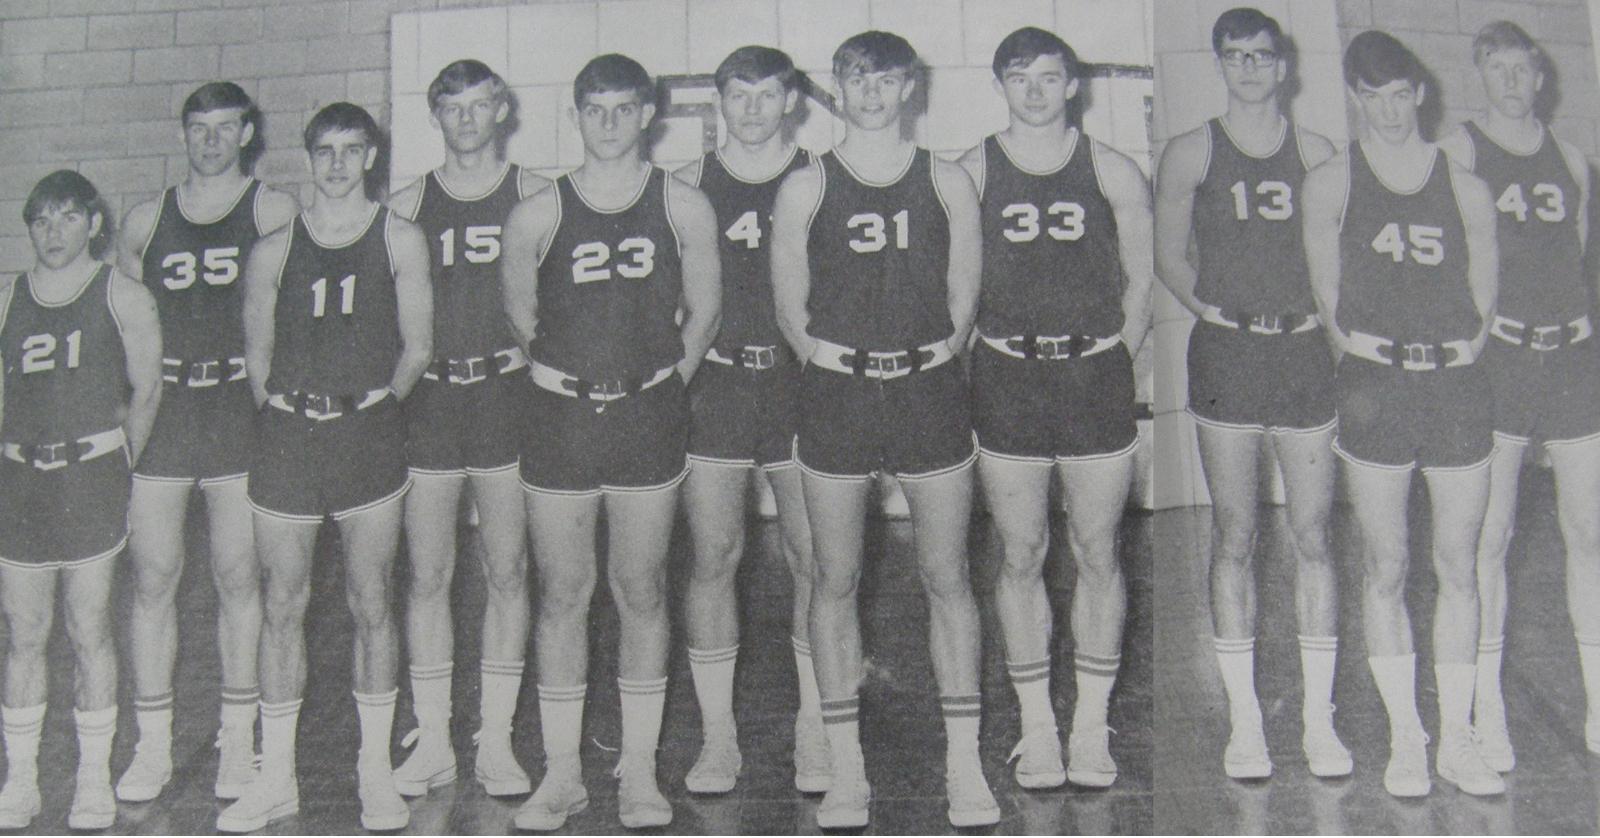 Newton Athletics' Hall of Fame Night – Saturday, January 11th